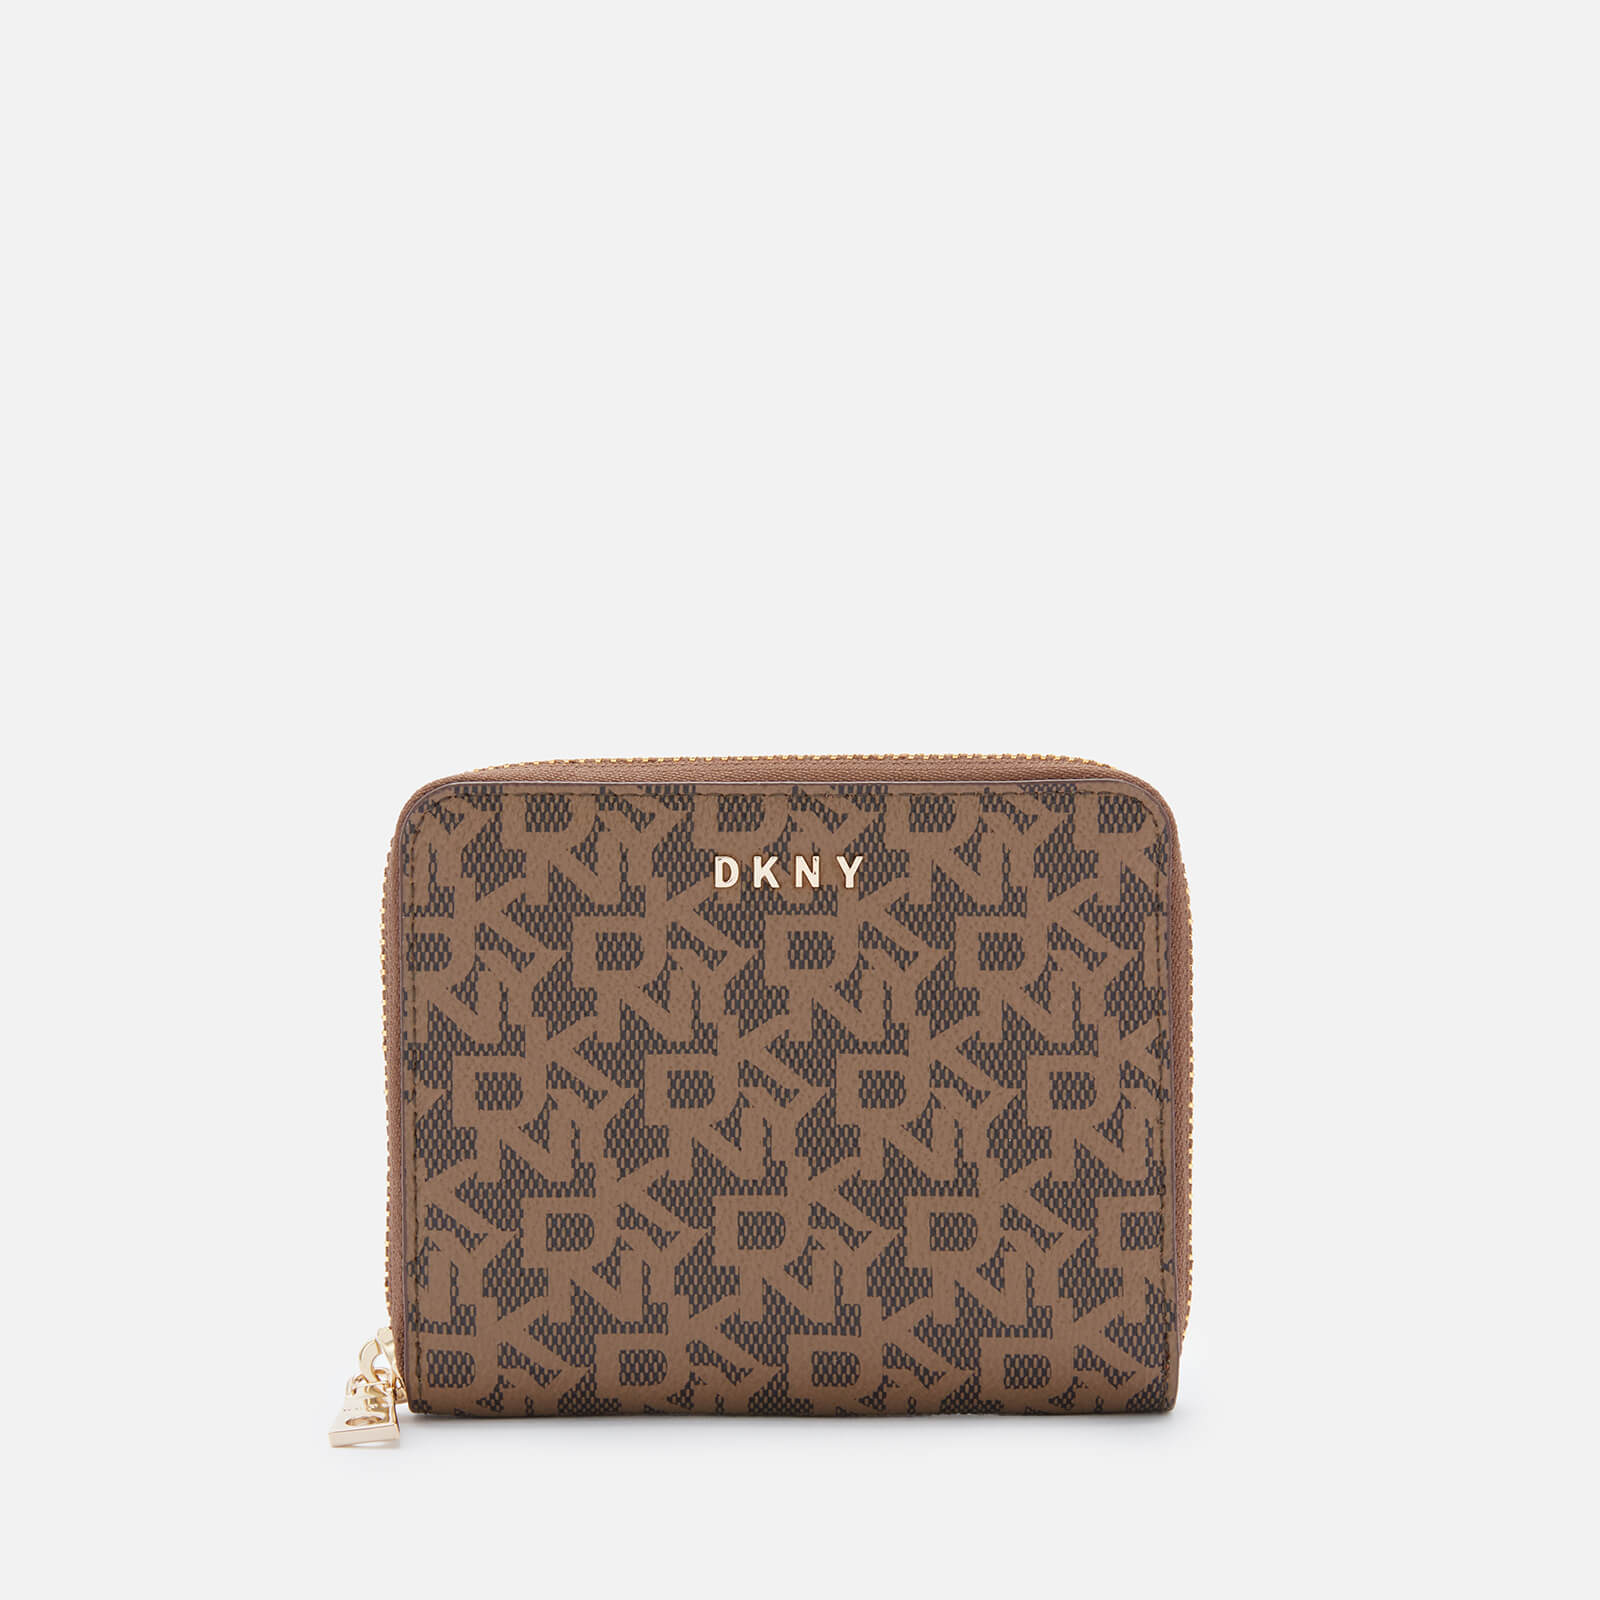 DKNY Women's Bryant Small Logo Zip Around Wallet - Mocha/Caramel